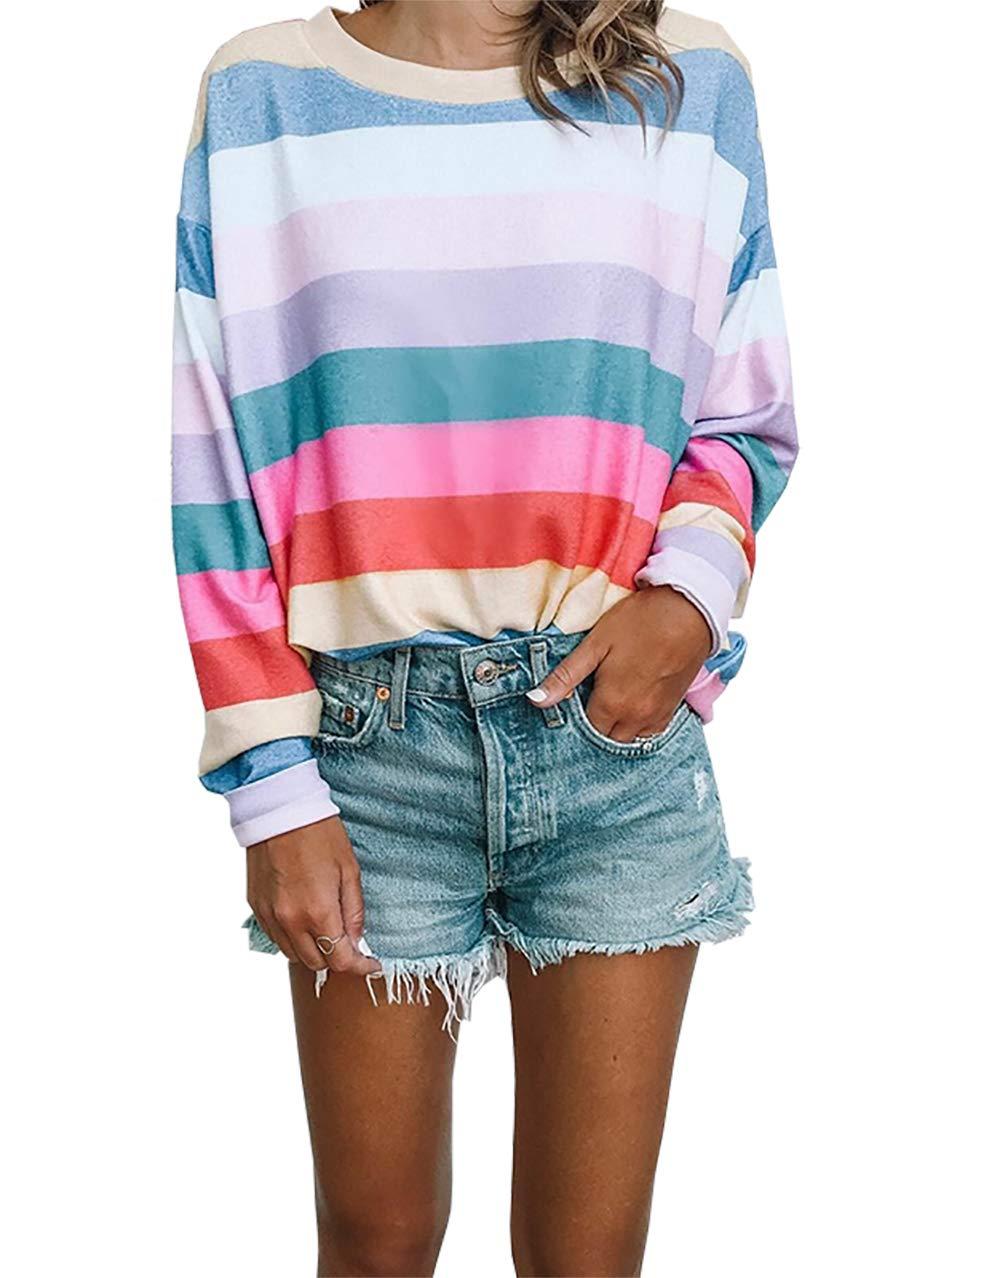 PRETTYGARDEN Women's Fashion Long Sleeve O-Neck Contrast Color Striped Casual Tops T-Shirt Tunic (Multicoloured-1, Medium)